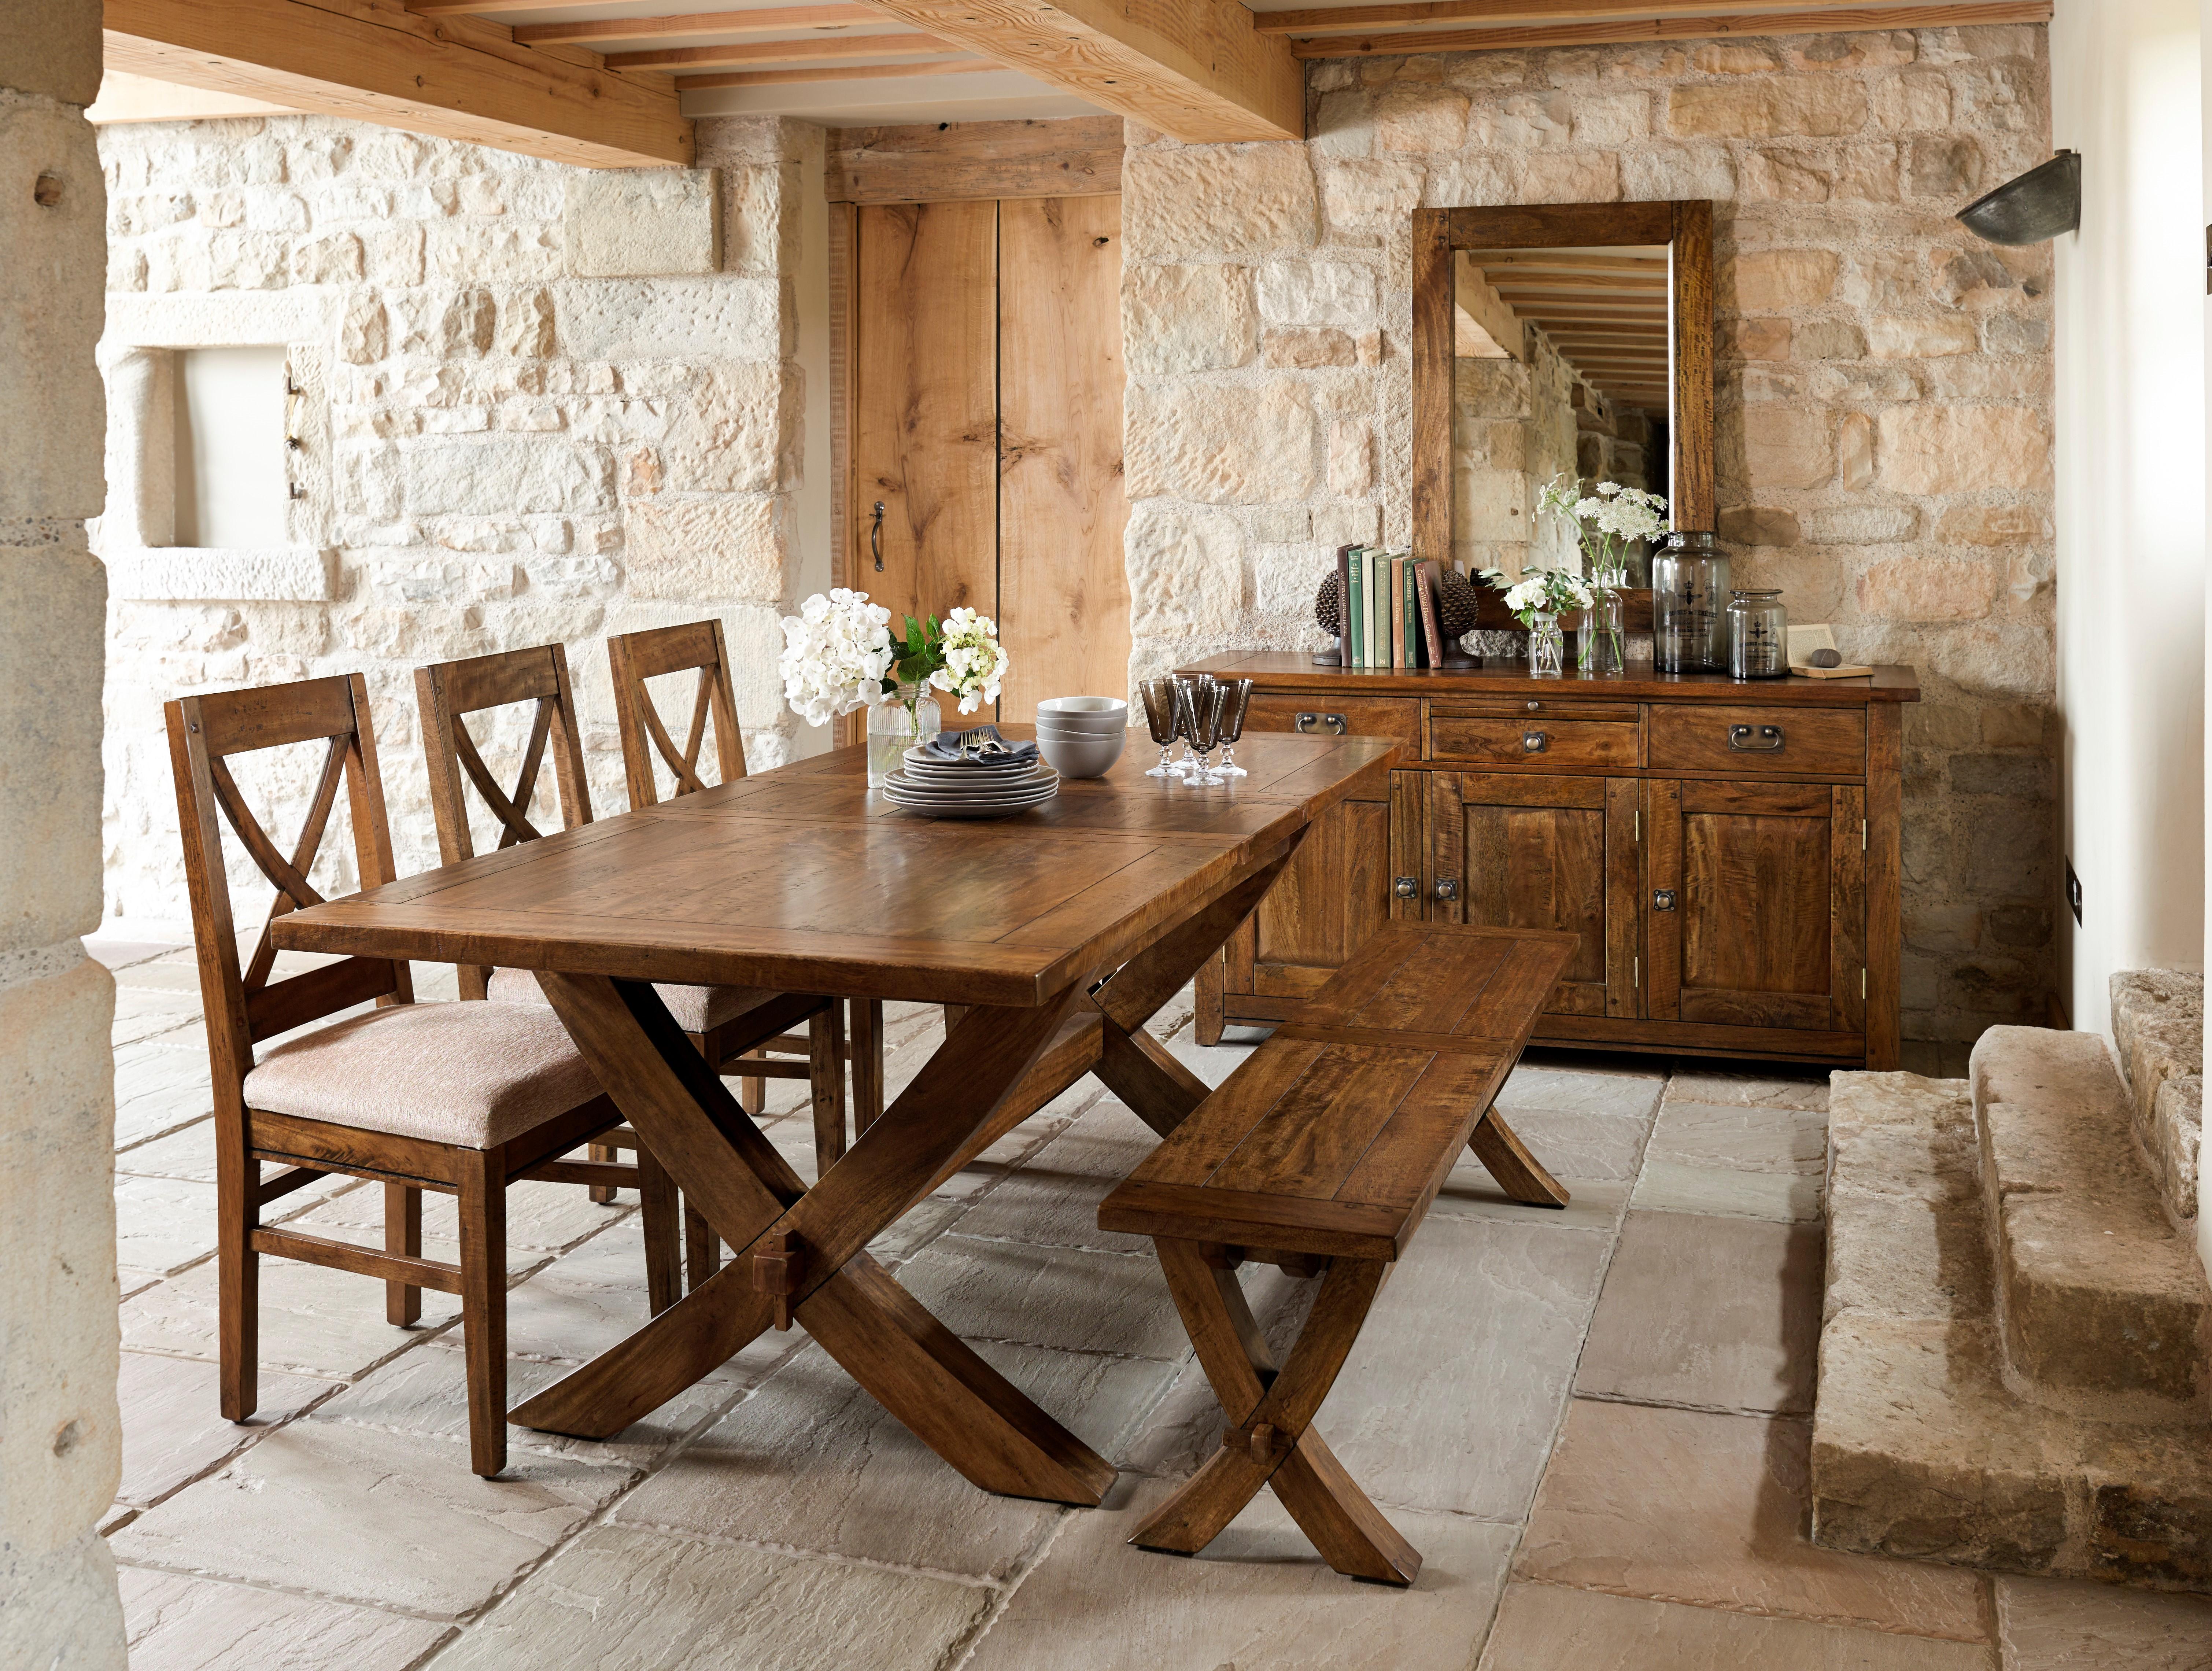 TABLE 170cm EXT TO 210cm x 100cm